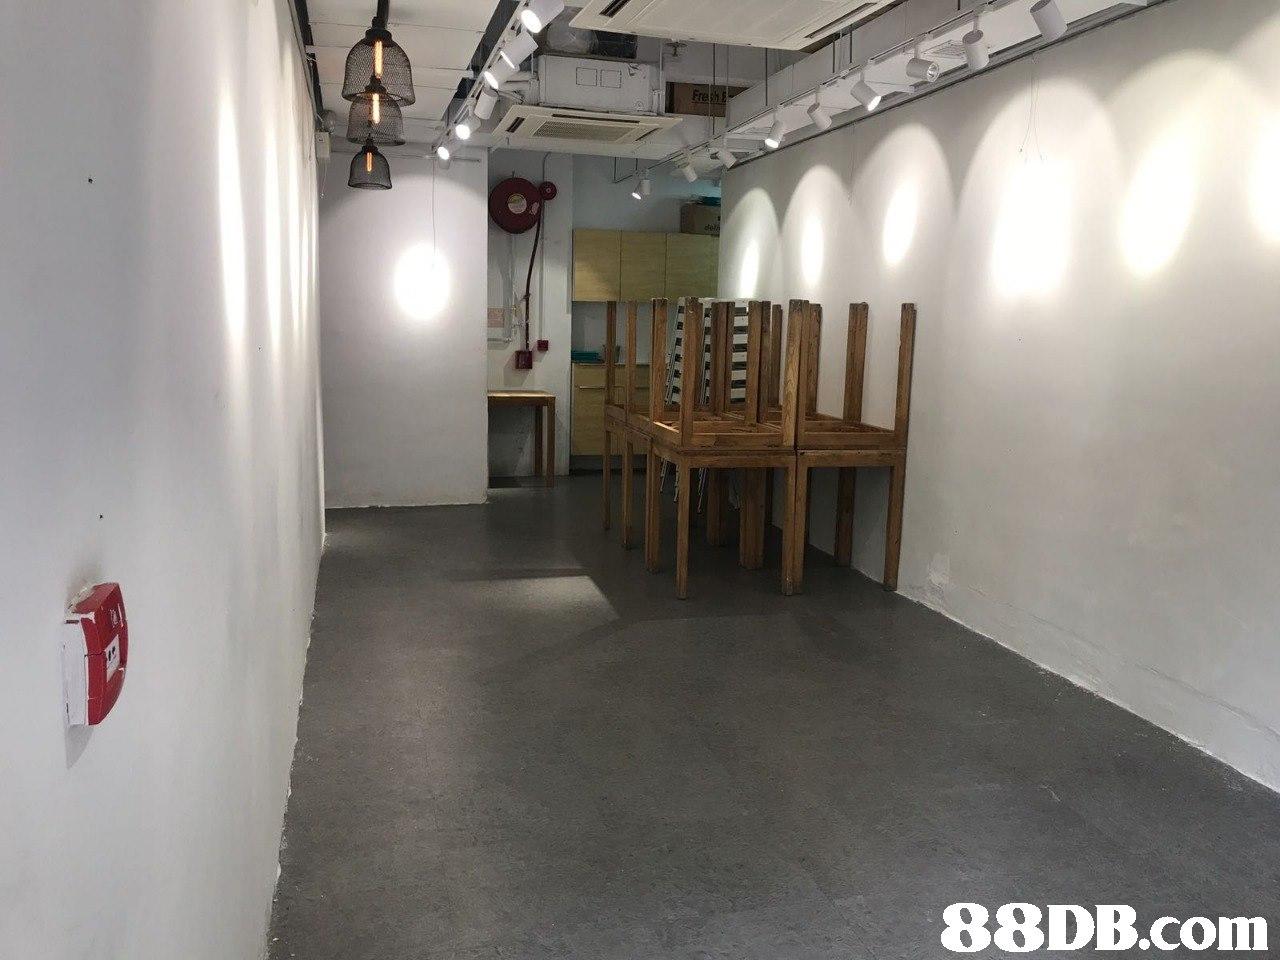 Property,Building,Room,Ceiling,Floor